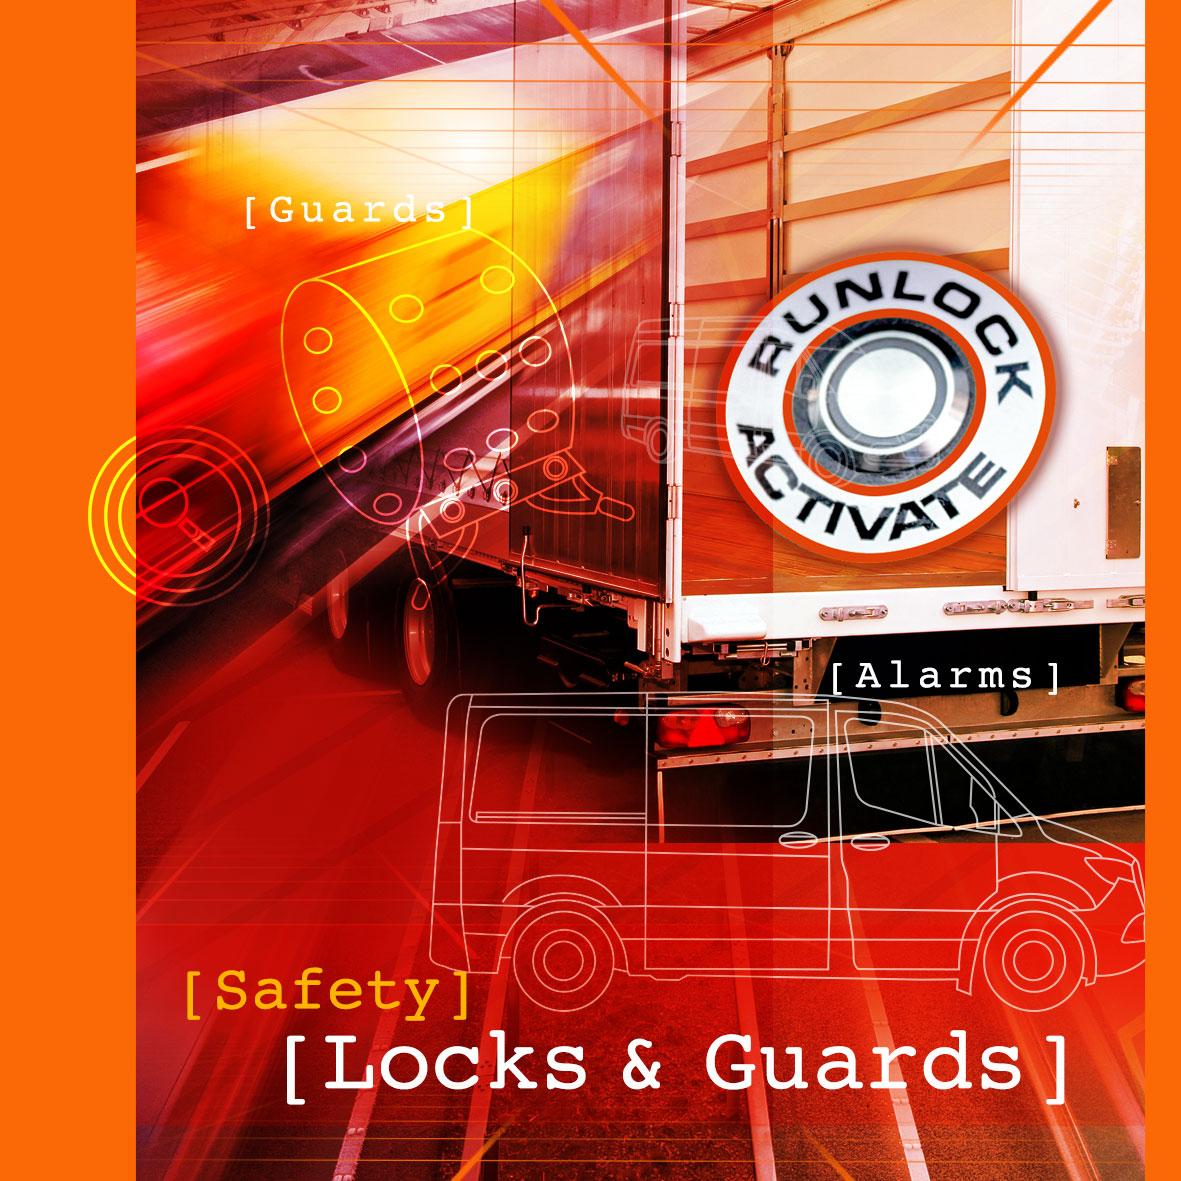 Locks & Guards